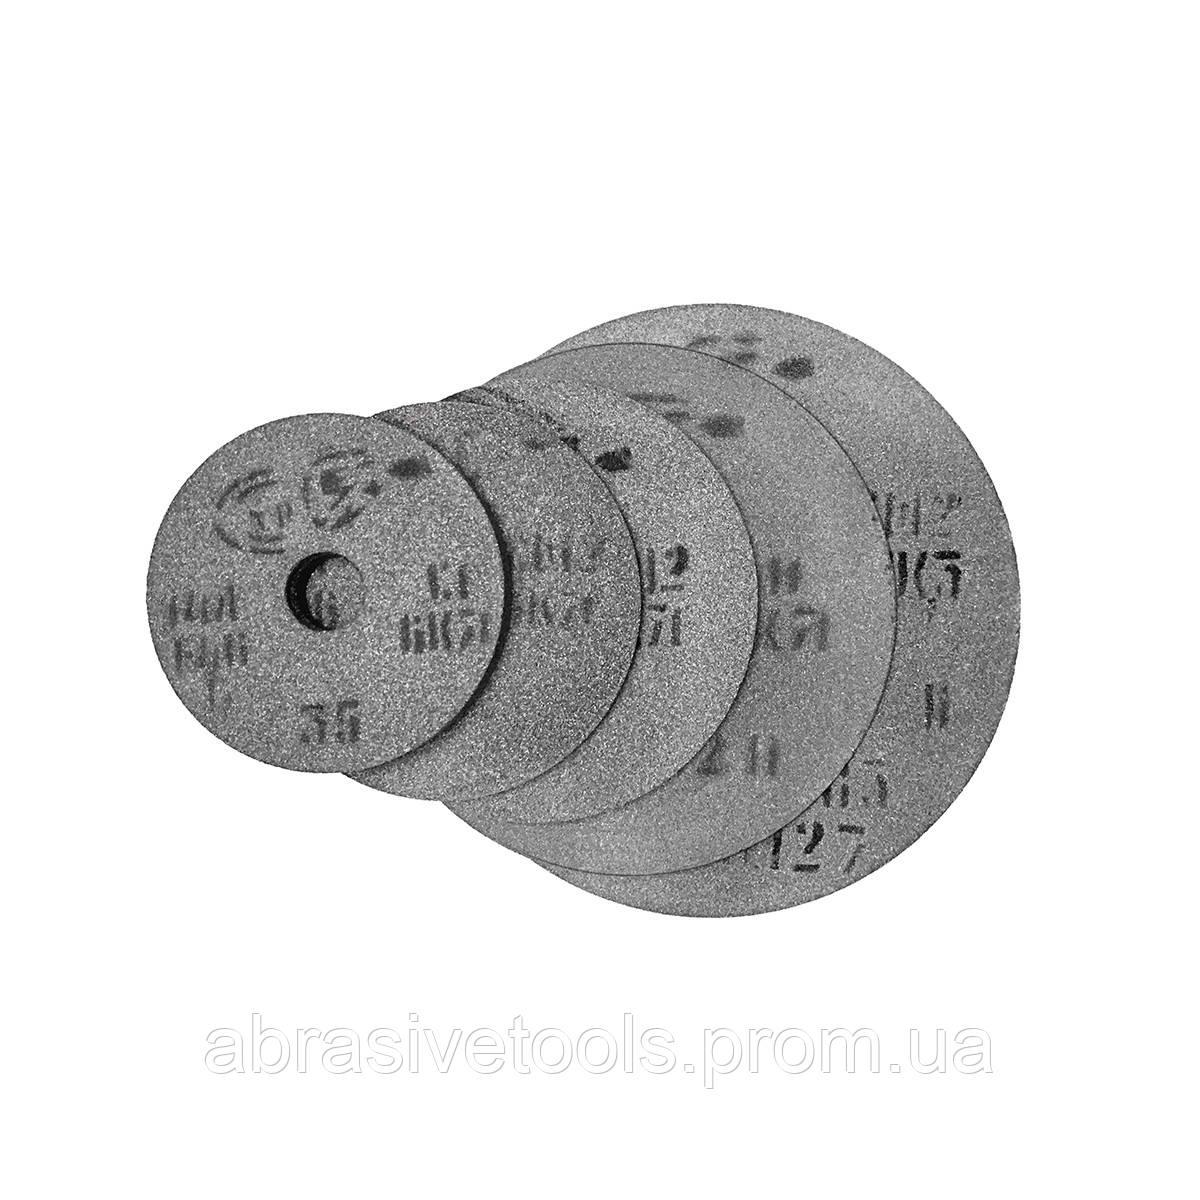 Круг шлифовальный 250х32х76  F46 СТ2 бакелит